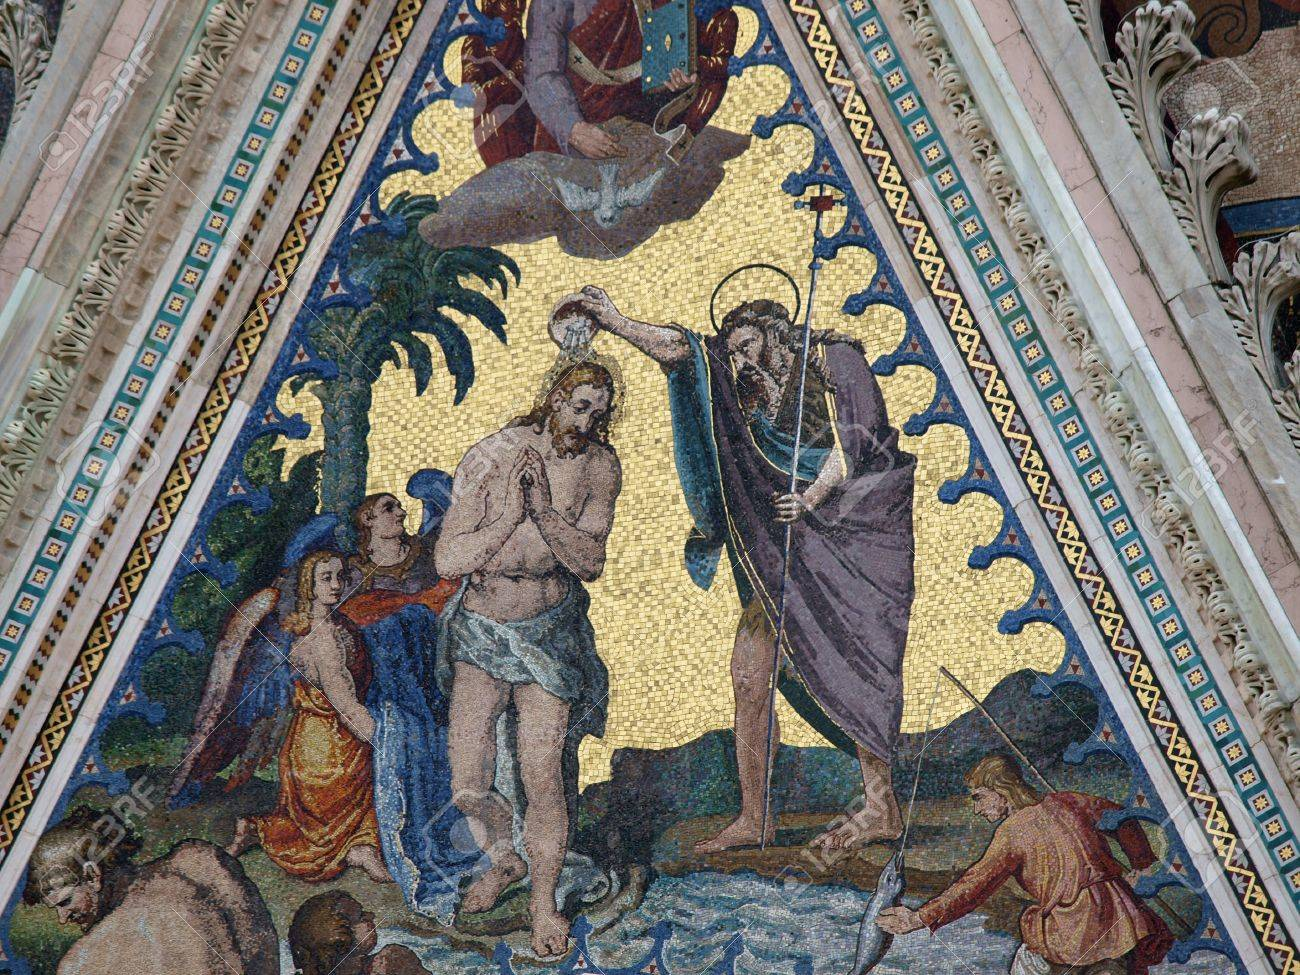 orvieto duomo facade the biblical scene of jesus baptism